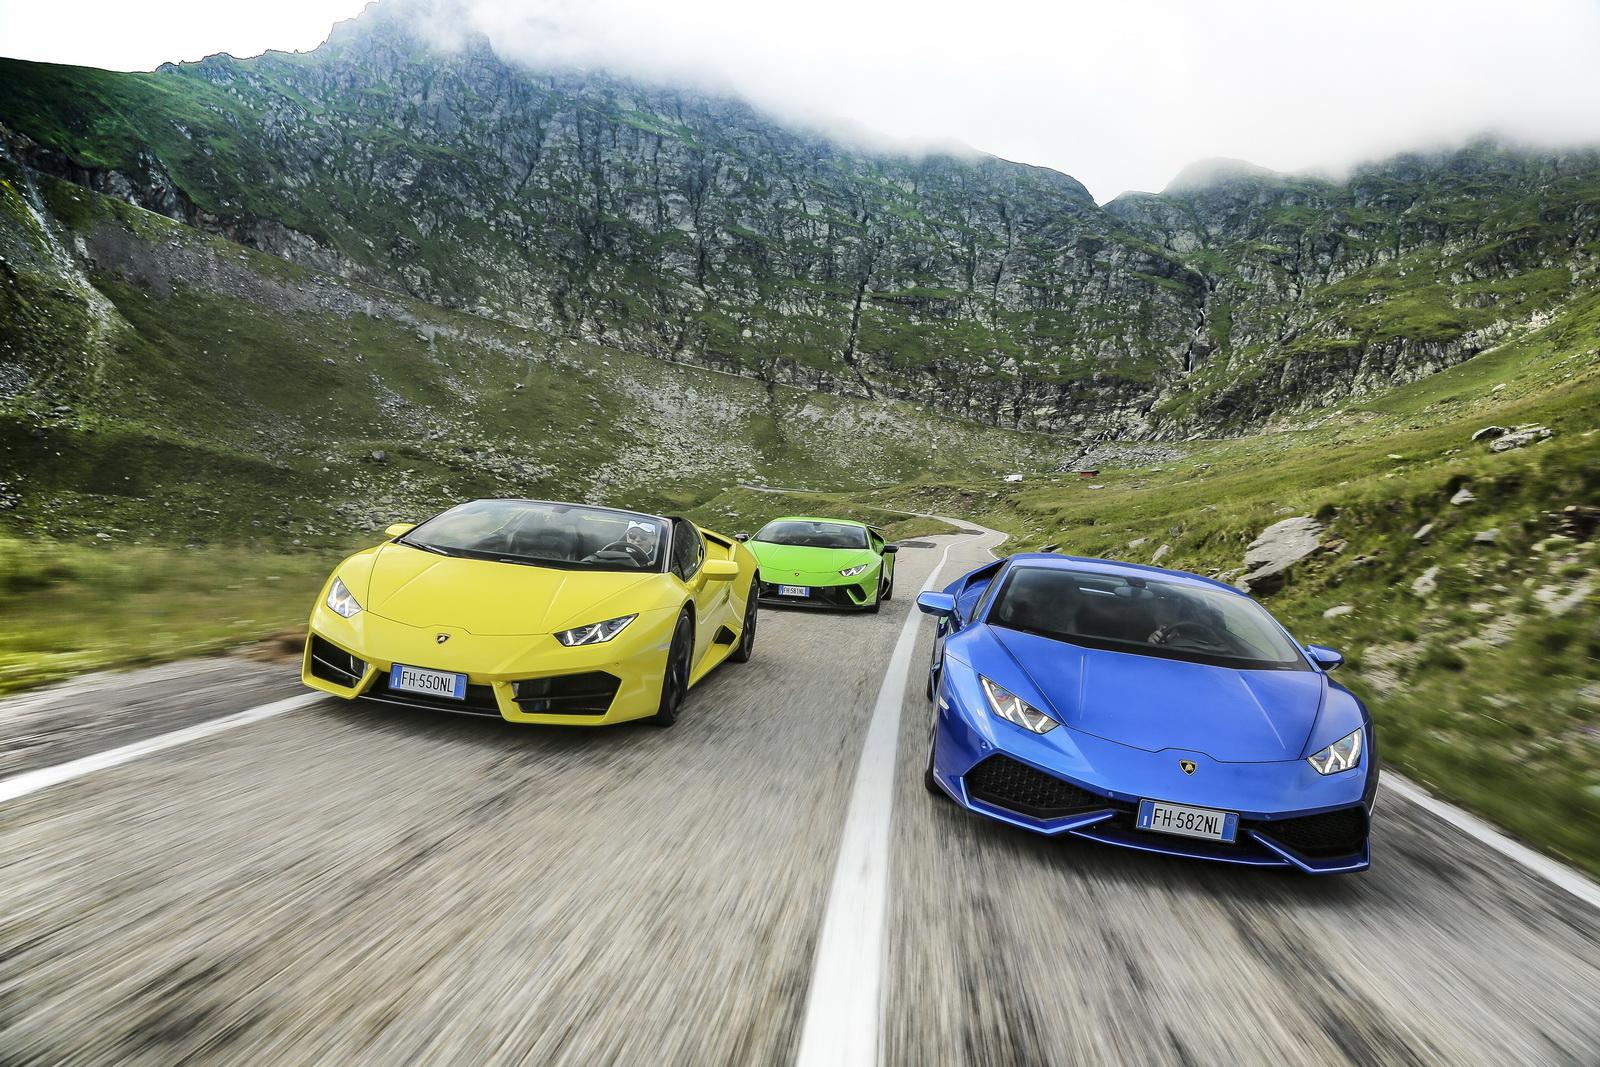 Lamborghini coches autonomos